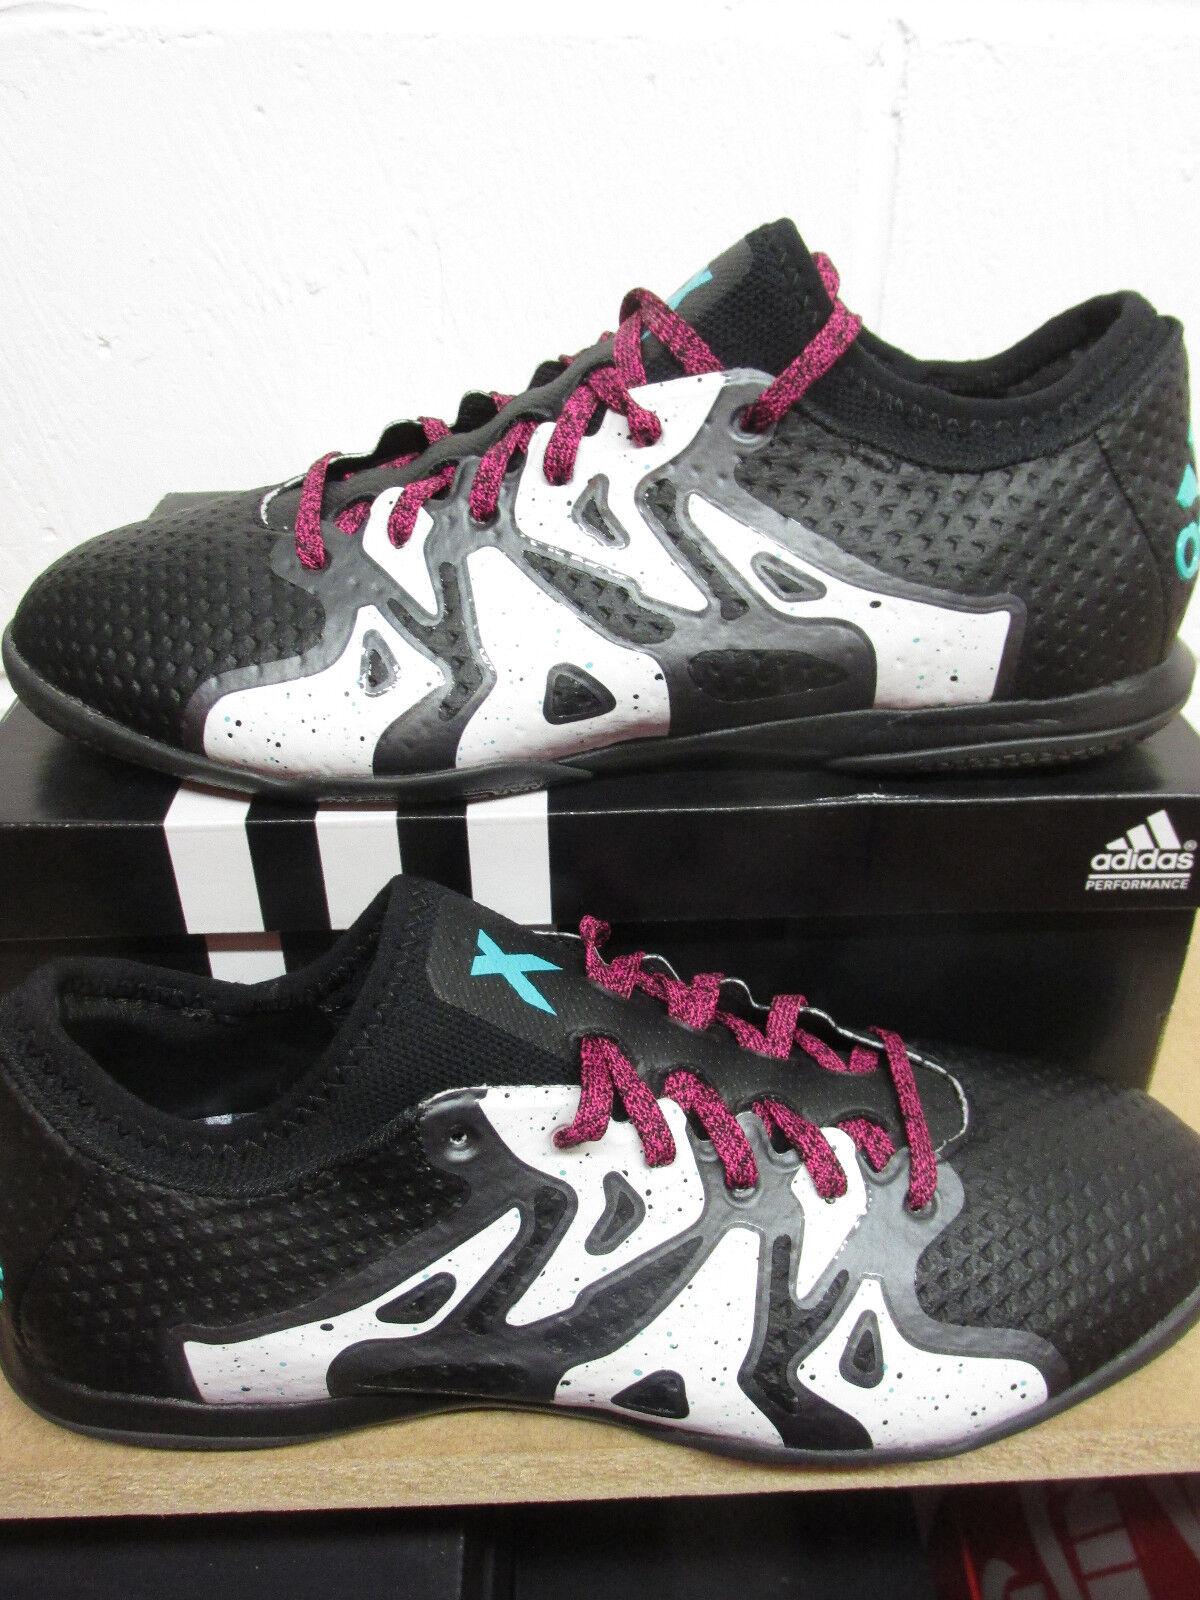 Adidas X 15 + Primeknit de Cour Chaussures de Primeknit Foot Hommes AQ3921 Football 9afe43